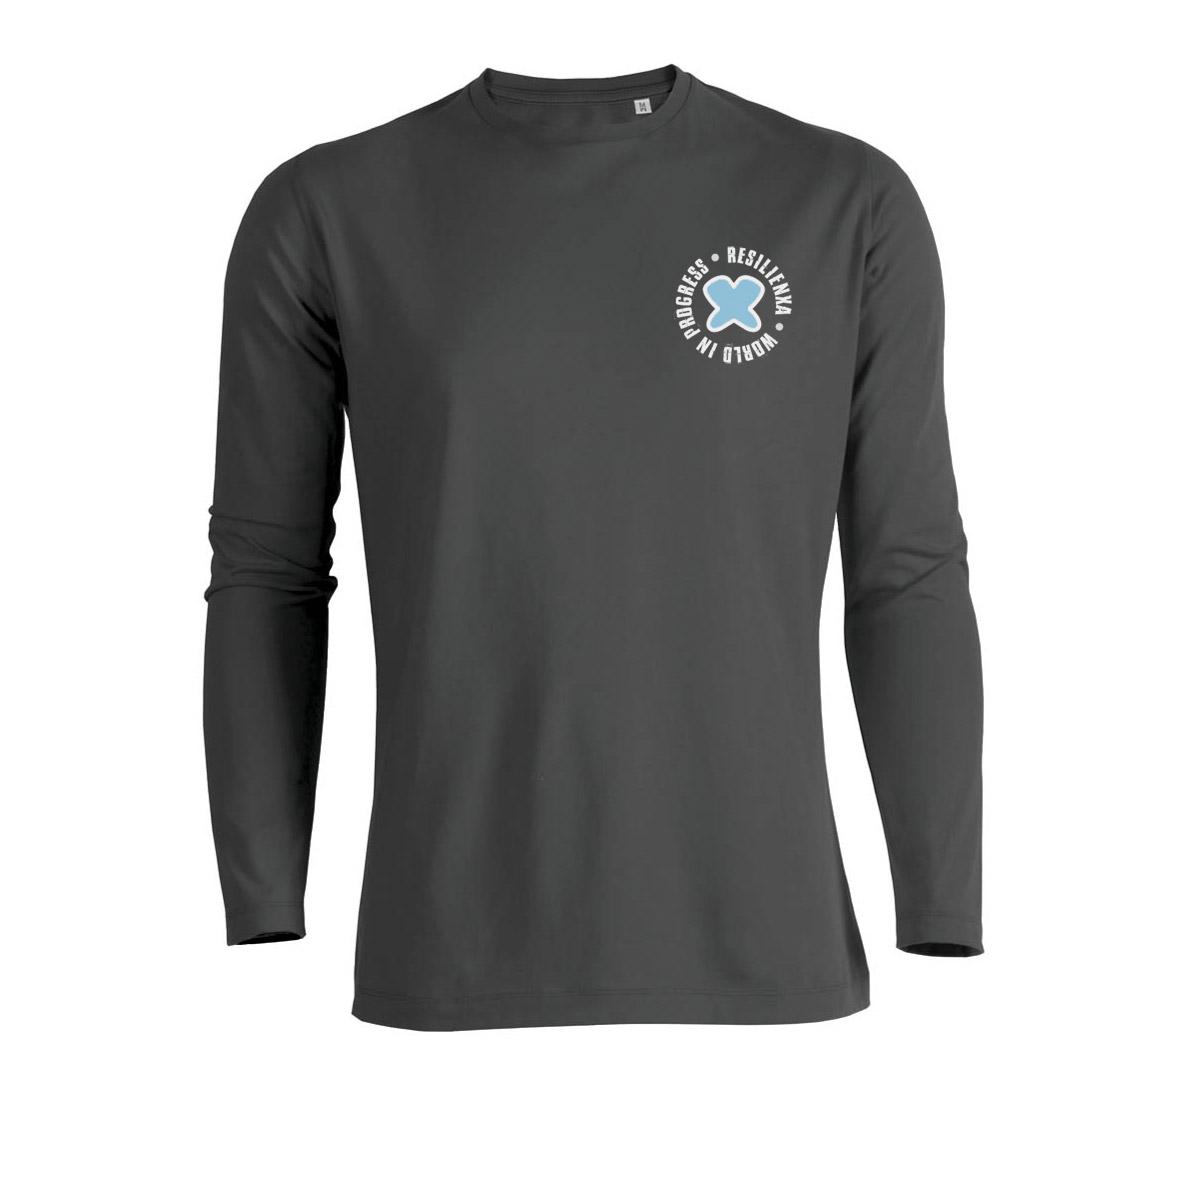 Tshirt-ManicaLunga-Anthracite